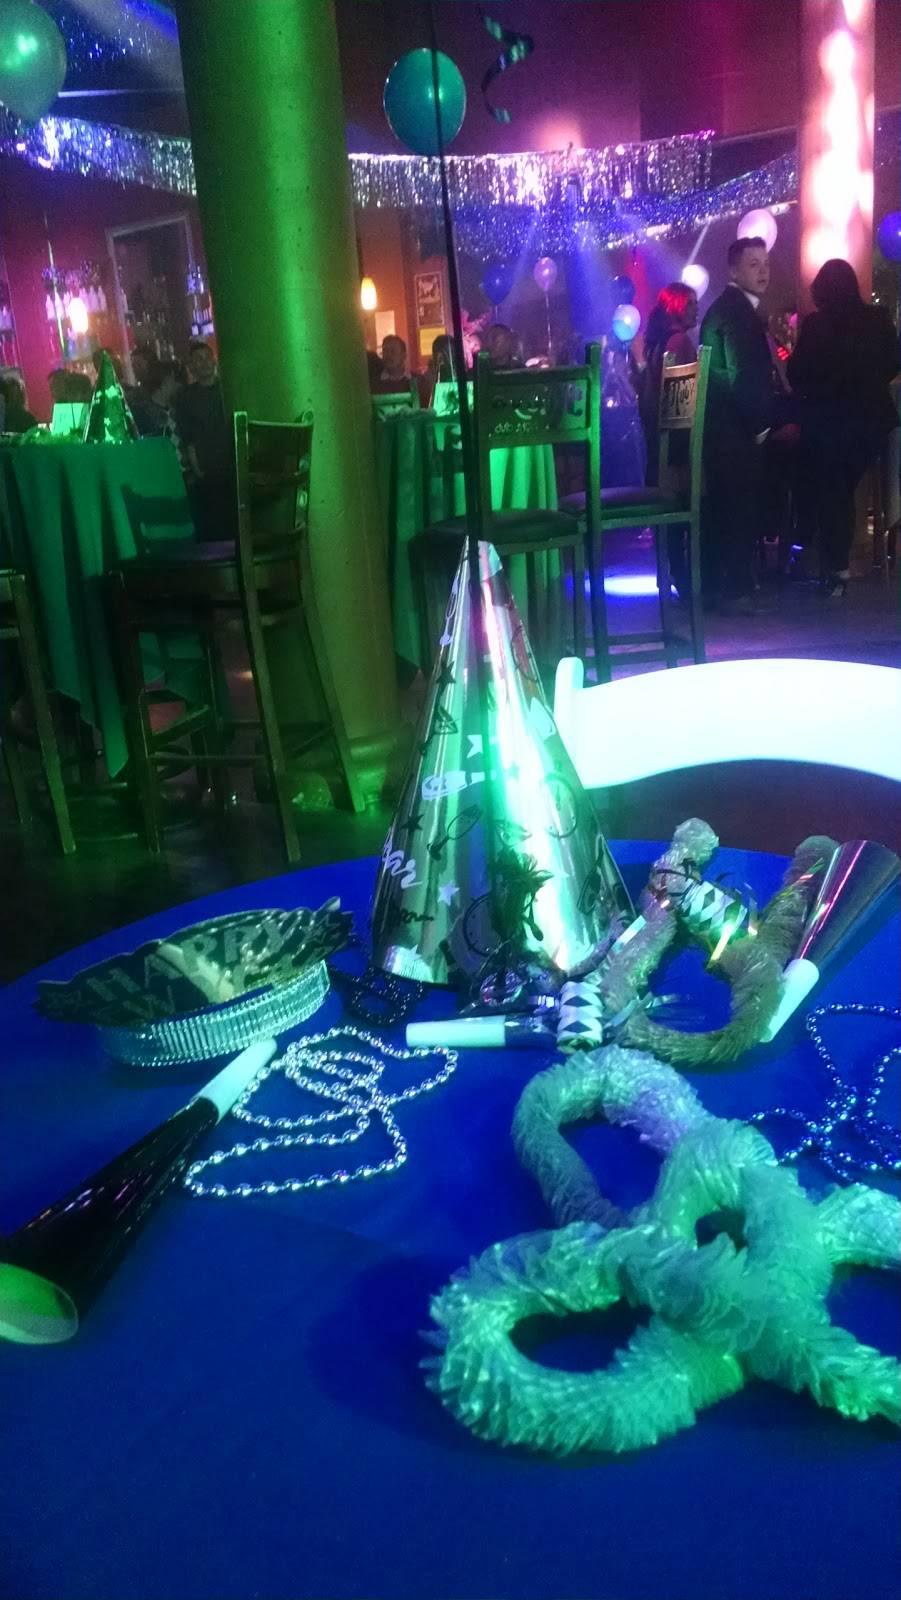 Rubys Nightclub | night club | 348 S Oxnard Blvd, Oxnard, CA 93030, USA | 8054862169 OR +1 805-486-2169